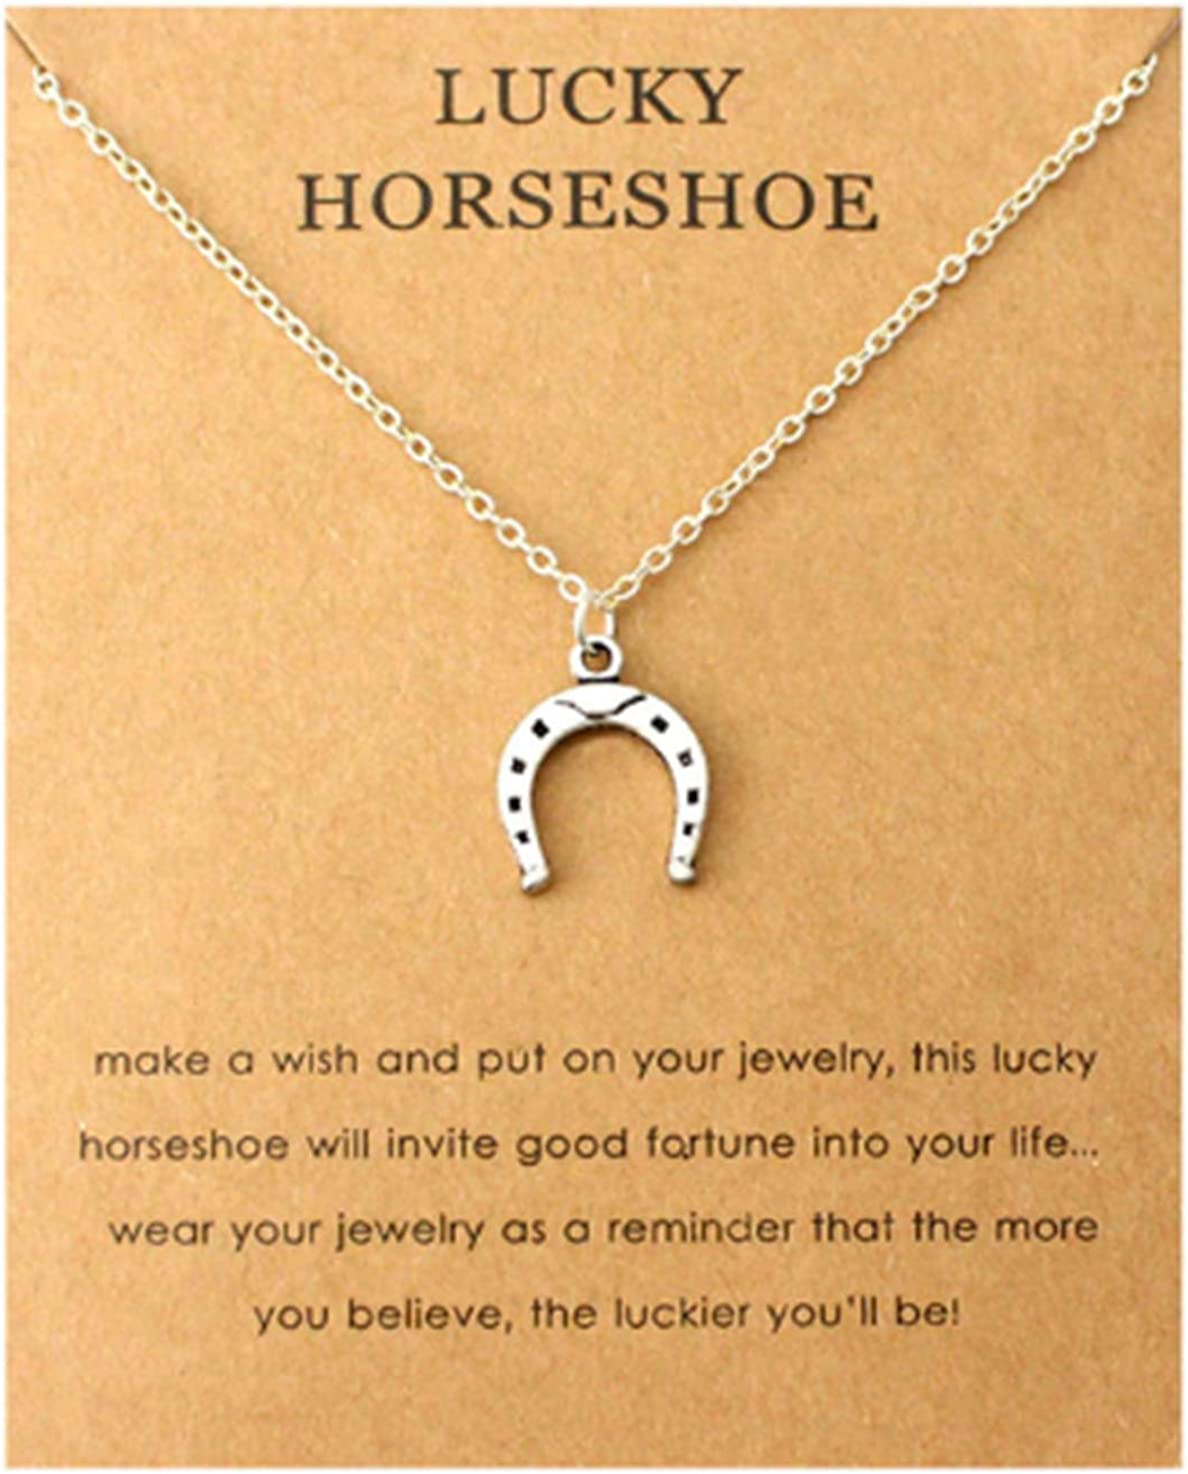 Collar de herradura de la suerte para niñas, colgante de plata, joyería inspiradora